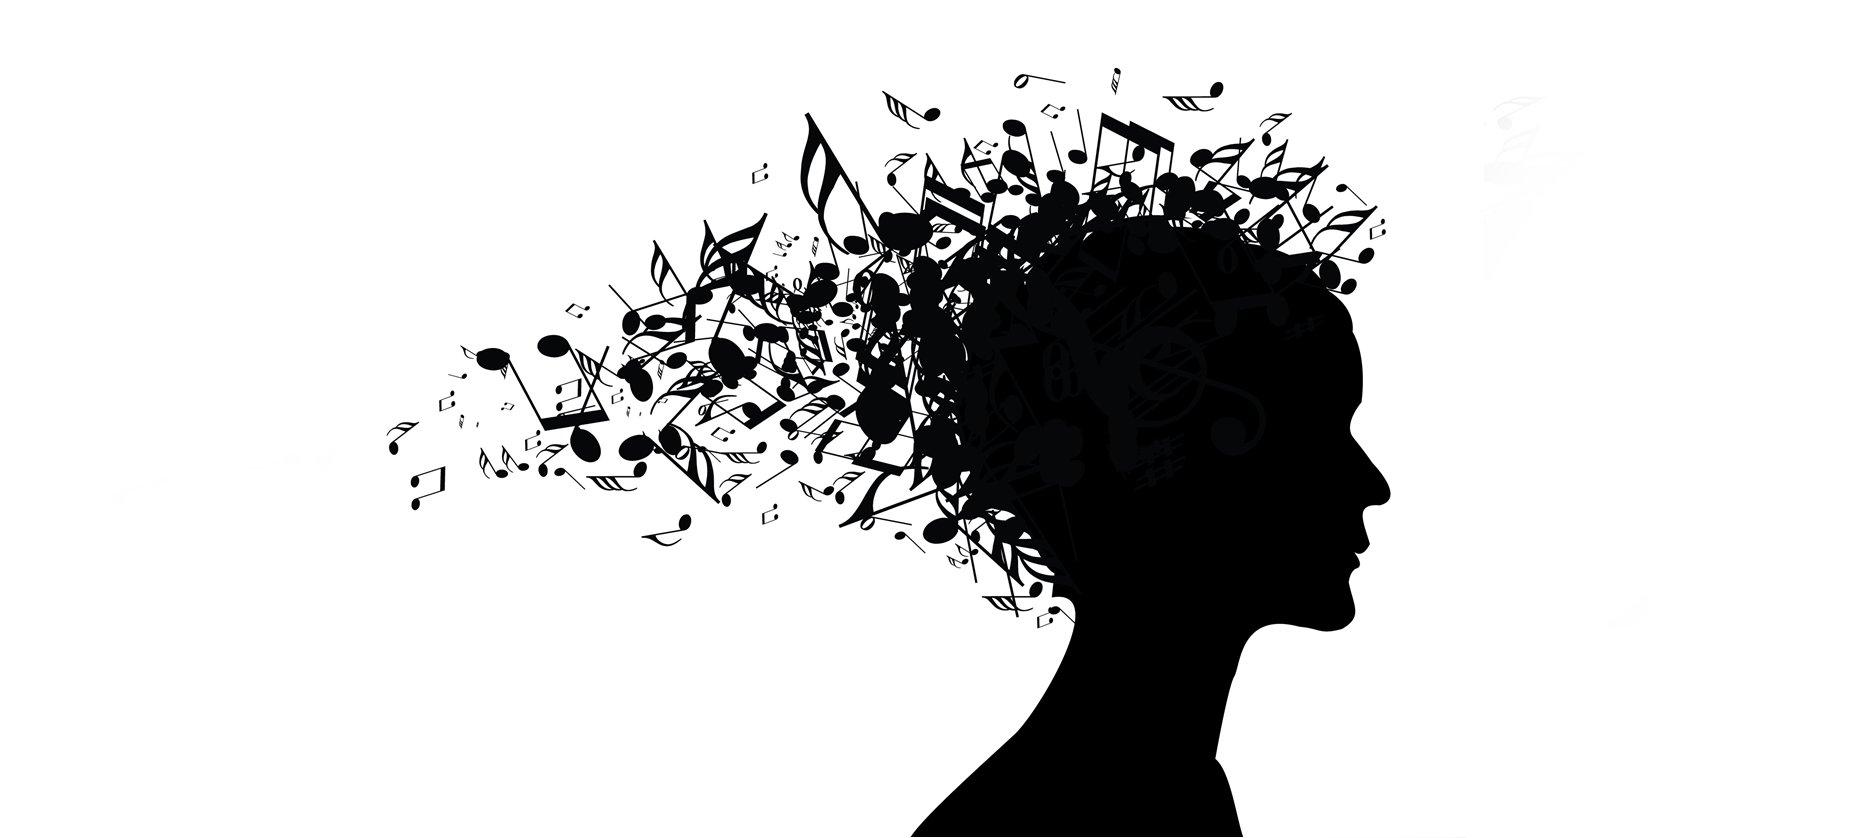 Arquivo Para Frases De Musicas Para Fotos Sozinha Tumblr Optclean